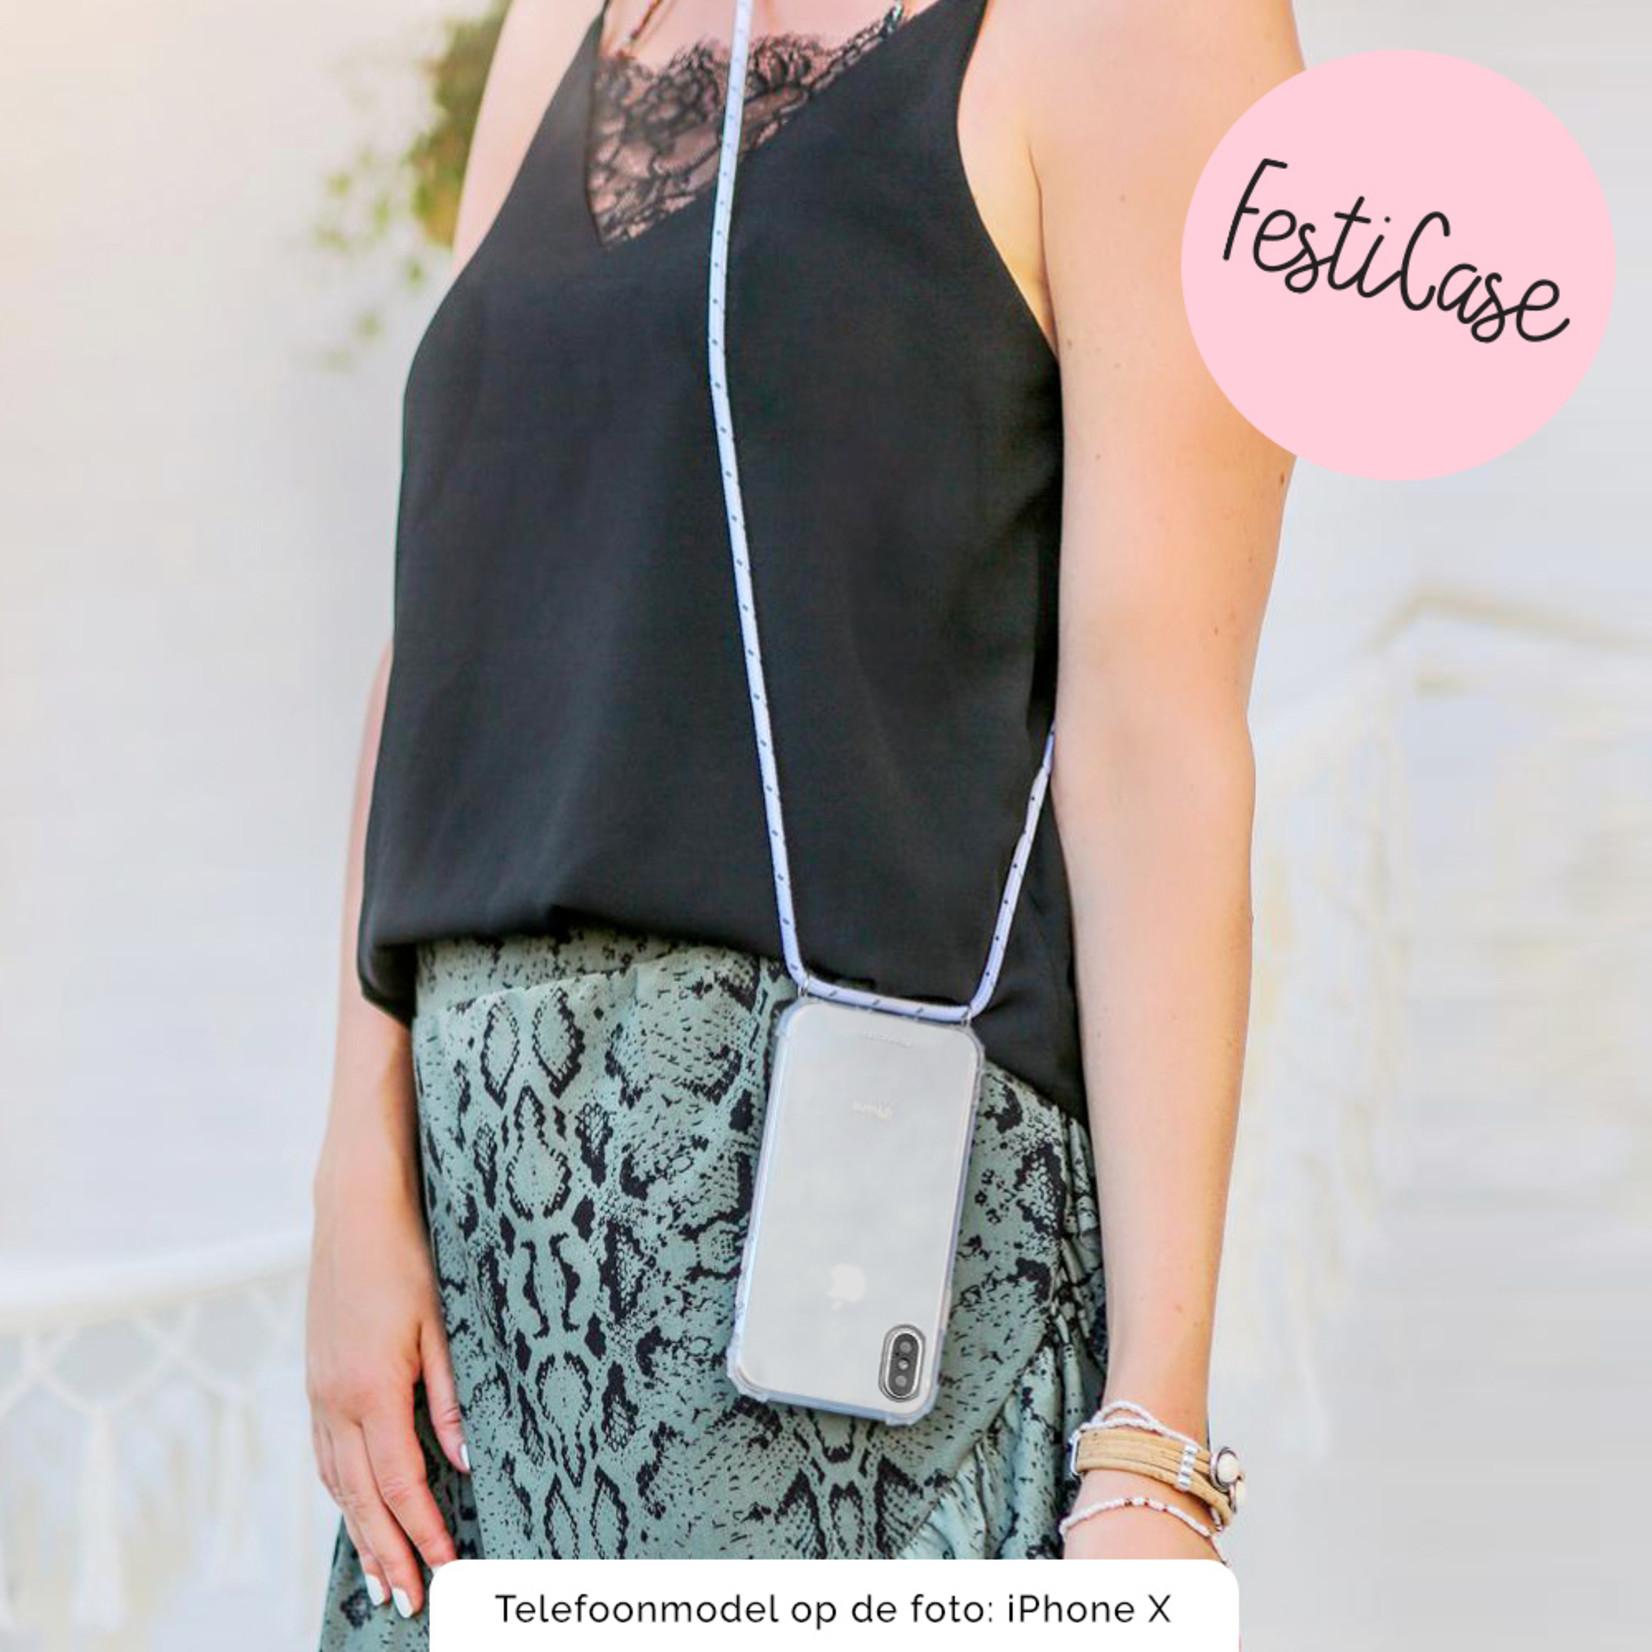 FOONCASE FESTICASE iPhone XS Telefoonhoesje met koord (Wit) TPU Soft Case - Transparant